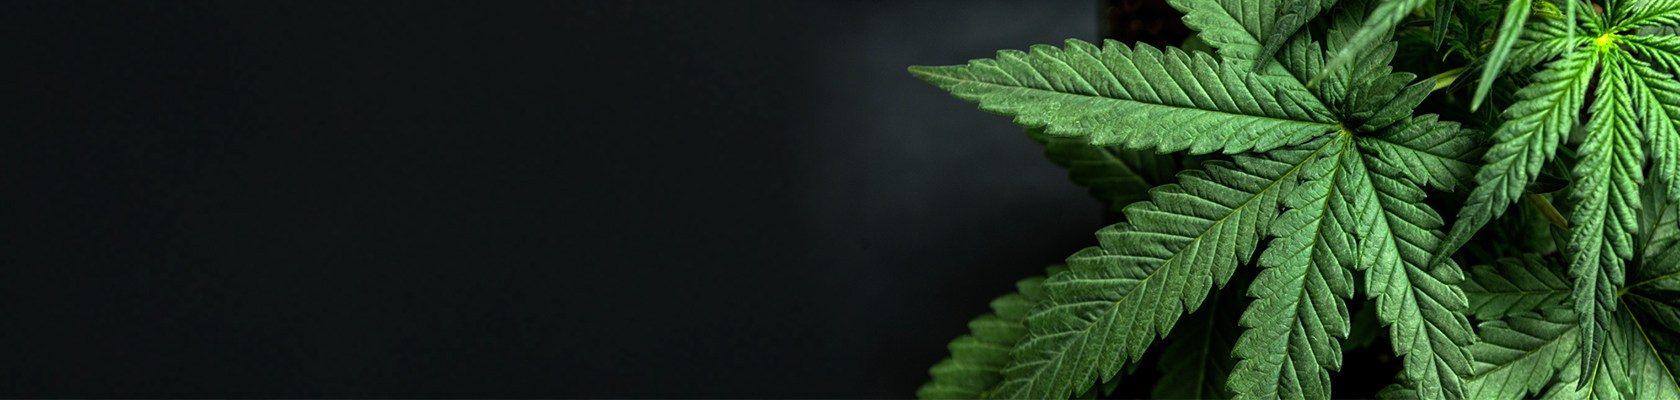 FAQ | Online Medical Marijuana Dispensary in Canada | Weed Hub Direct